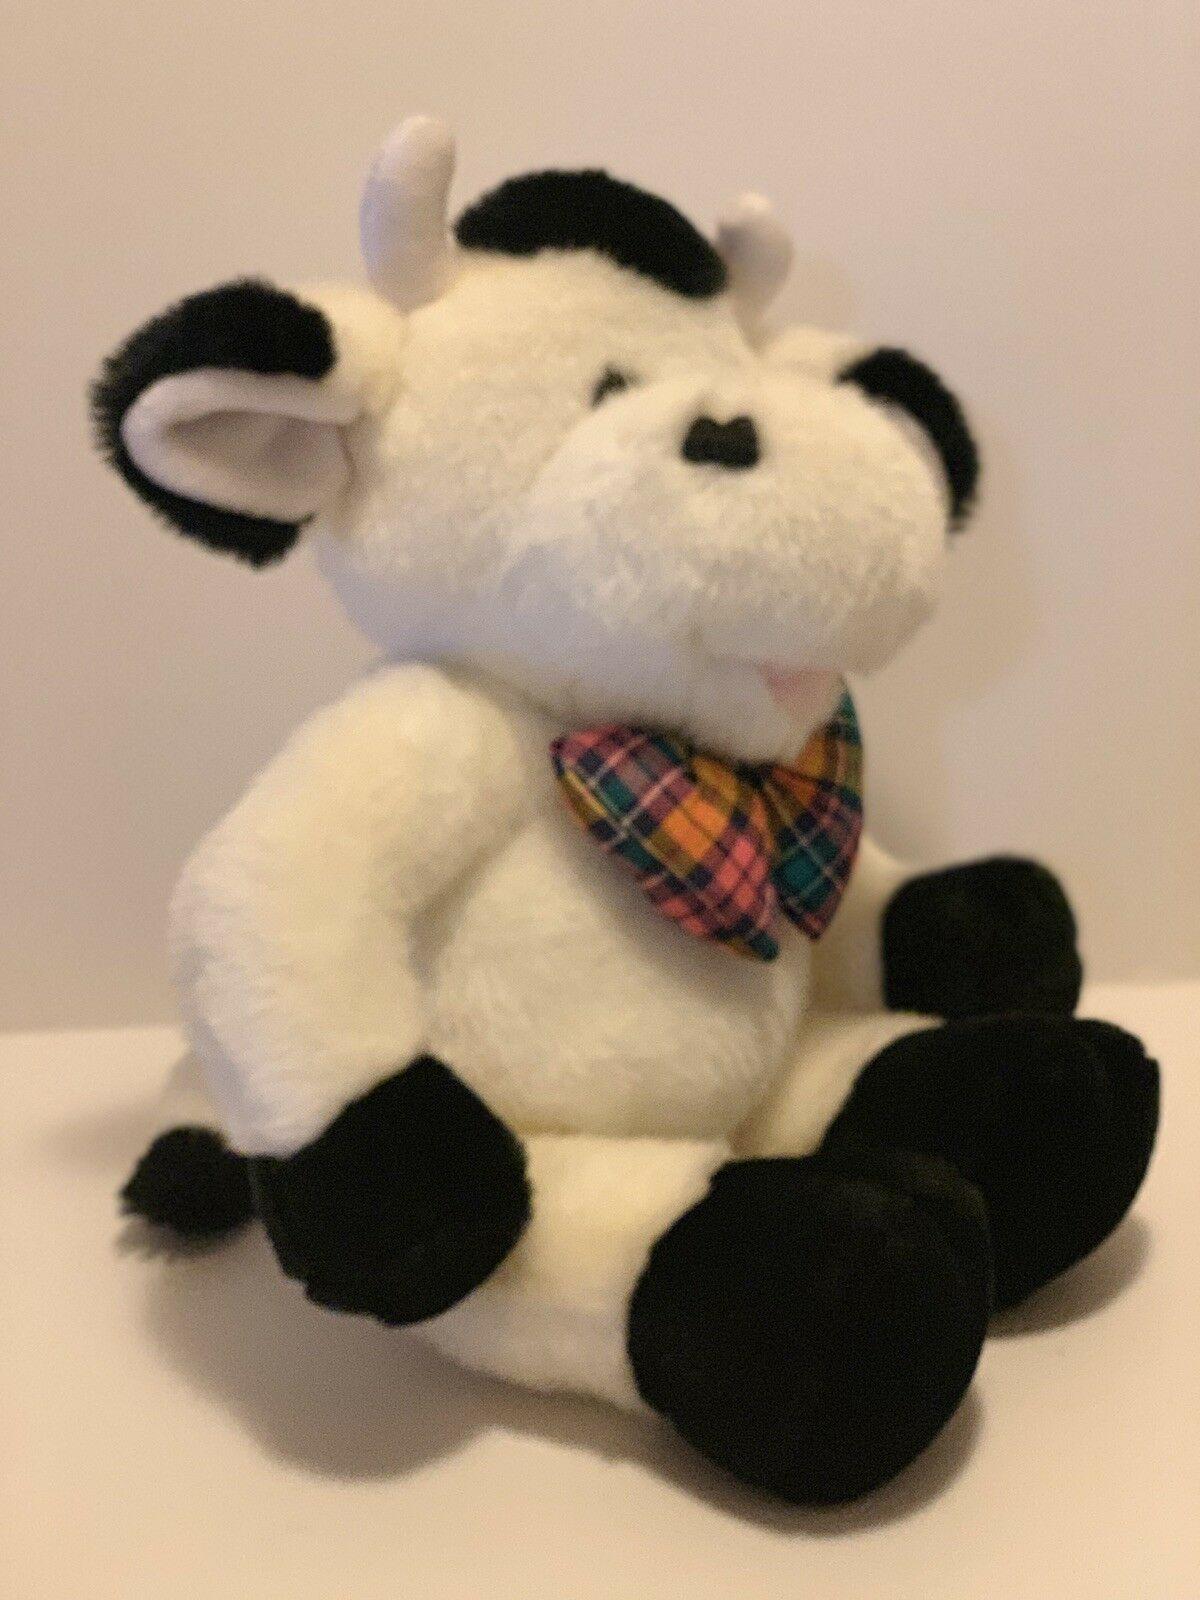 "Commonwealth Plush Cow Black White Stuffed Animal Plaid Bow Tie Soft 14"" Toy image 2"